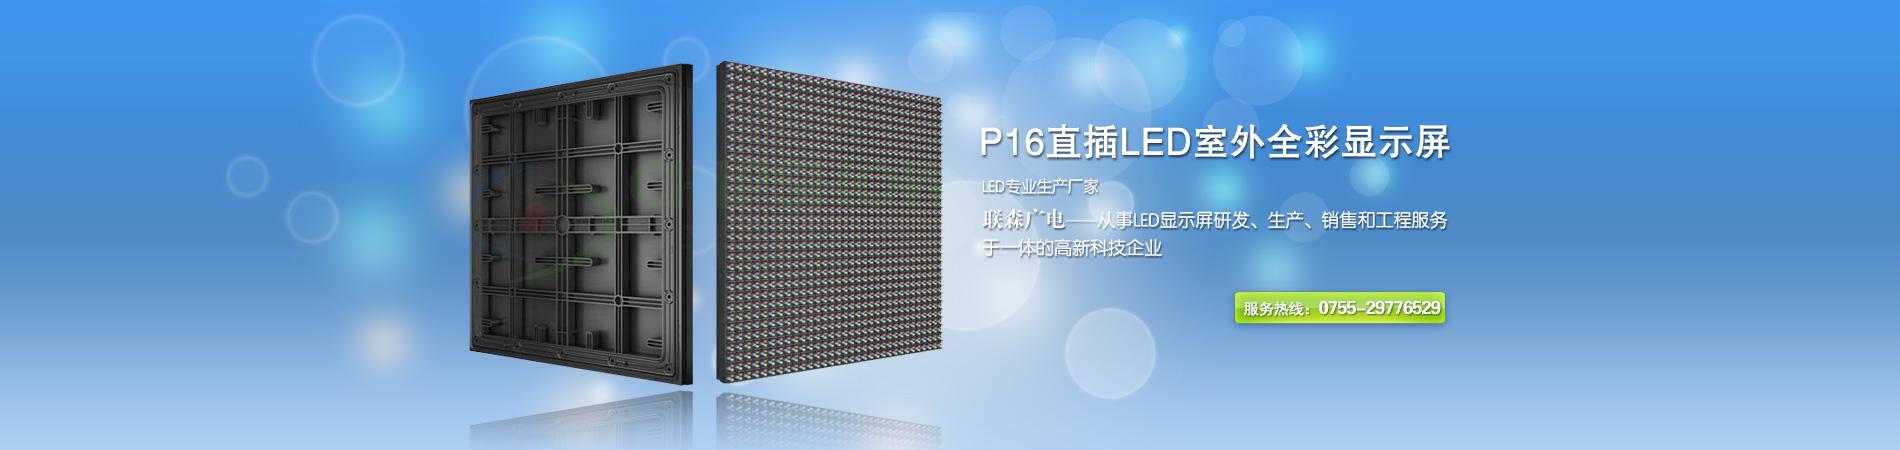 LED云顶集团网站图片